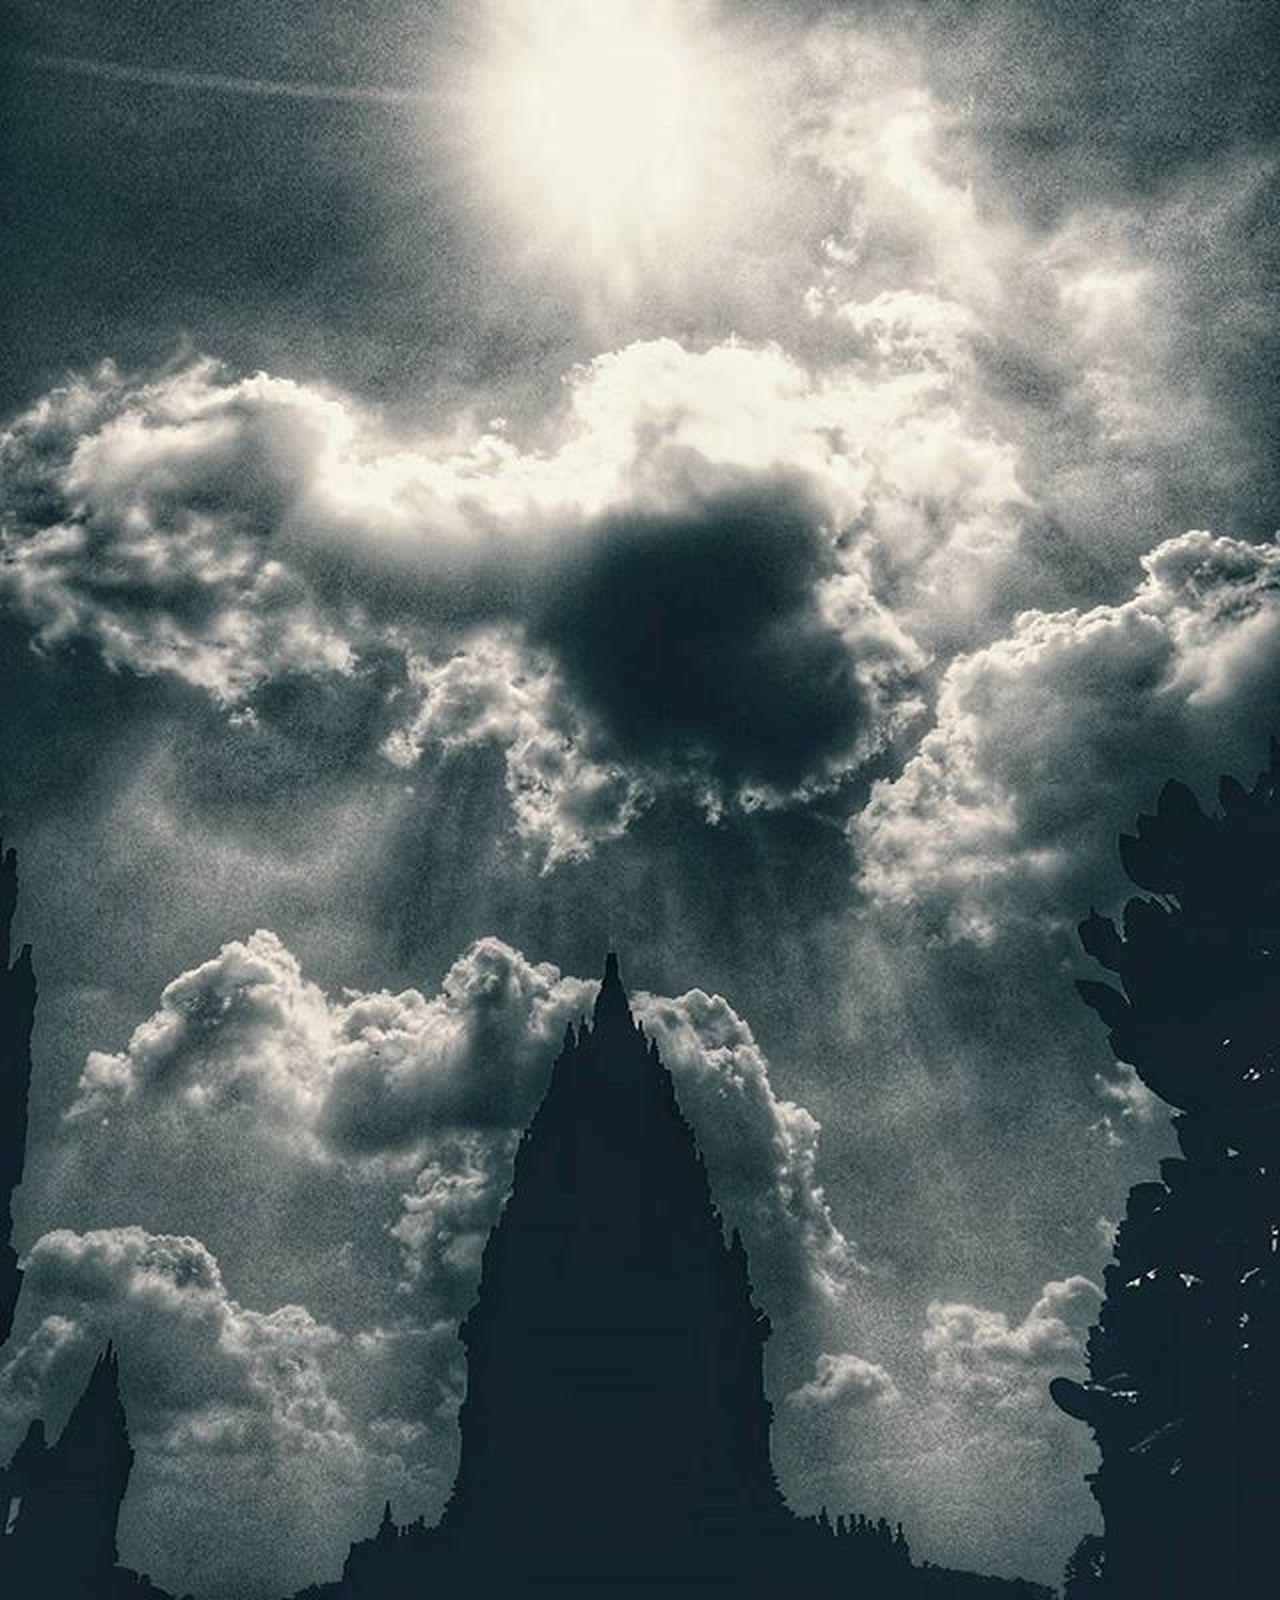 Di Balik Warna .. @geonusantara @geojabodetabek Upram019 011600666 Geojabodetabek lok : taman martani Geojateng Instajawa Instajateng Bw Bw_crew Bw_photooftheday Amateurs_shot Kompasnusantara Serikat_fi Amateurs_bnw Amateurphotography Clouds Instabwphoto Cloudporn Vscofilm Architecture Sky Vscophoto Blackandwhite Hitamputih Hitam Darkness igblacknwhite igblackandwhite monocrome instablackandwhite instablack